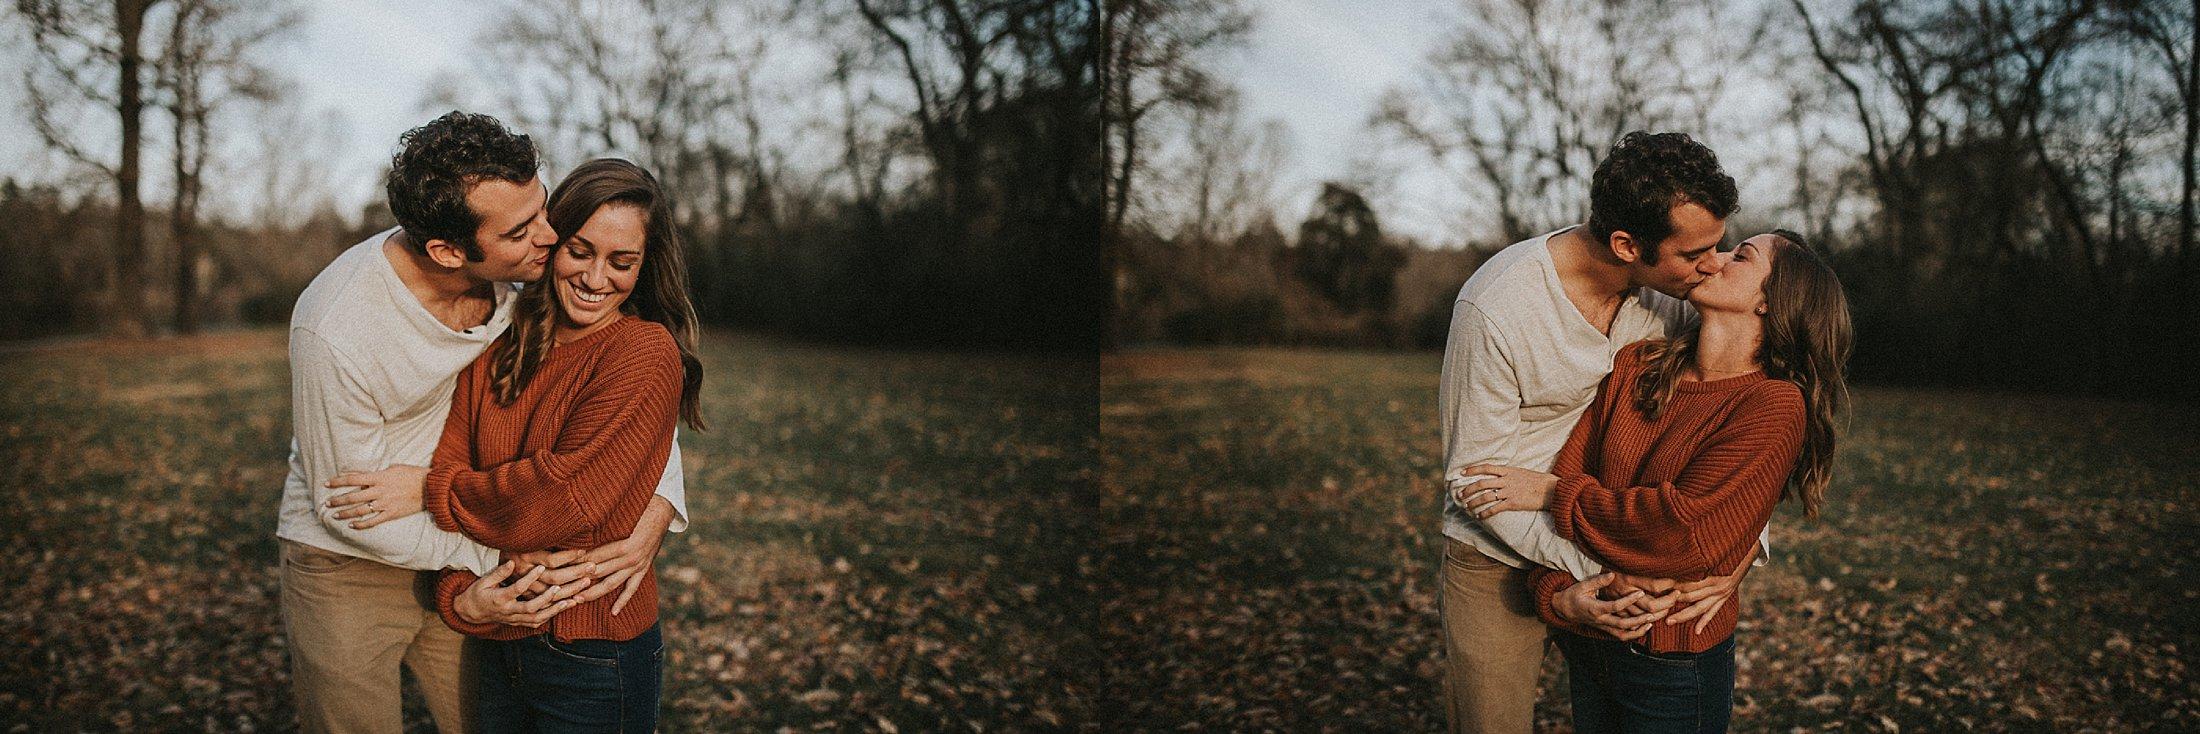 Alternative-wedding-photographers-nashville-tn--3.jpg